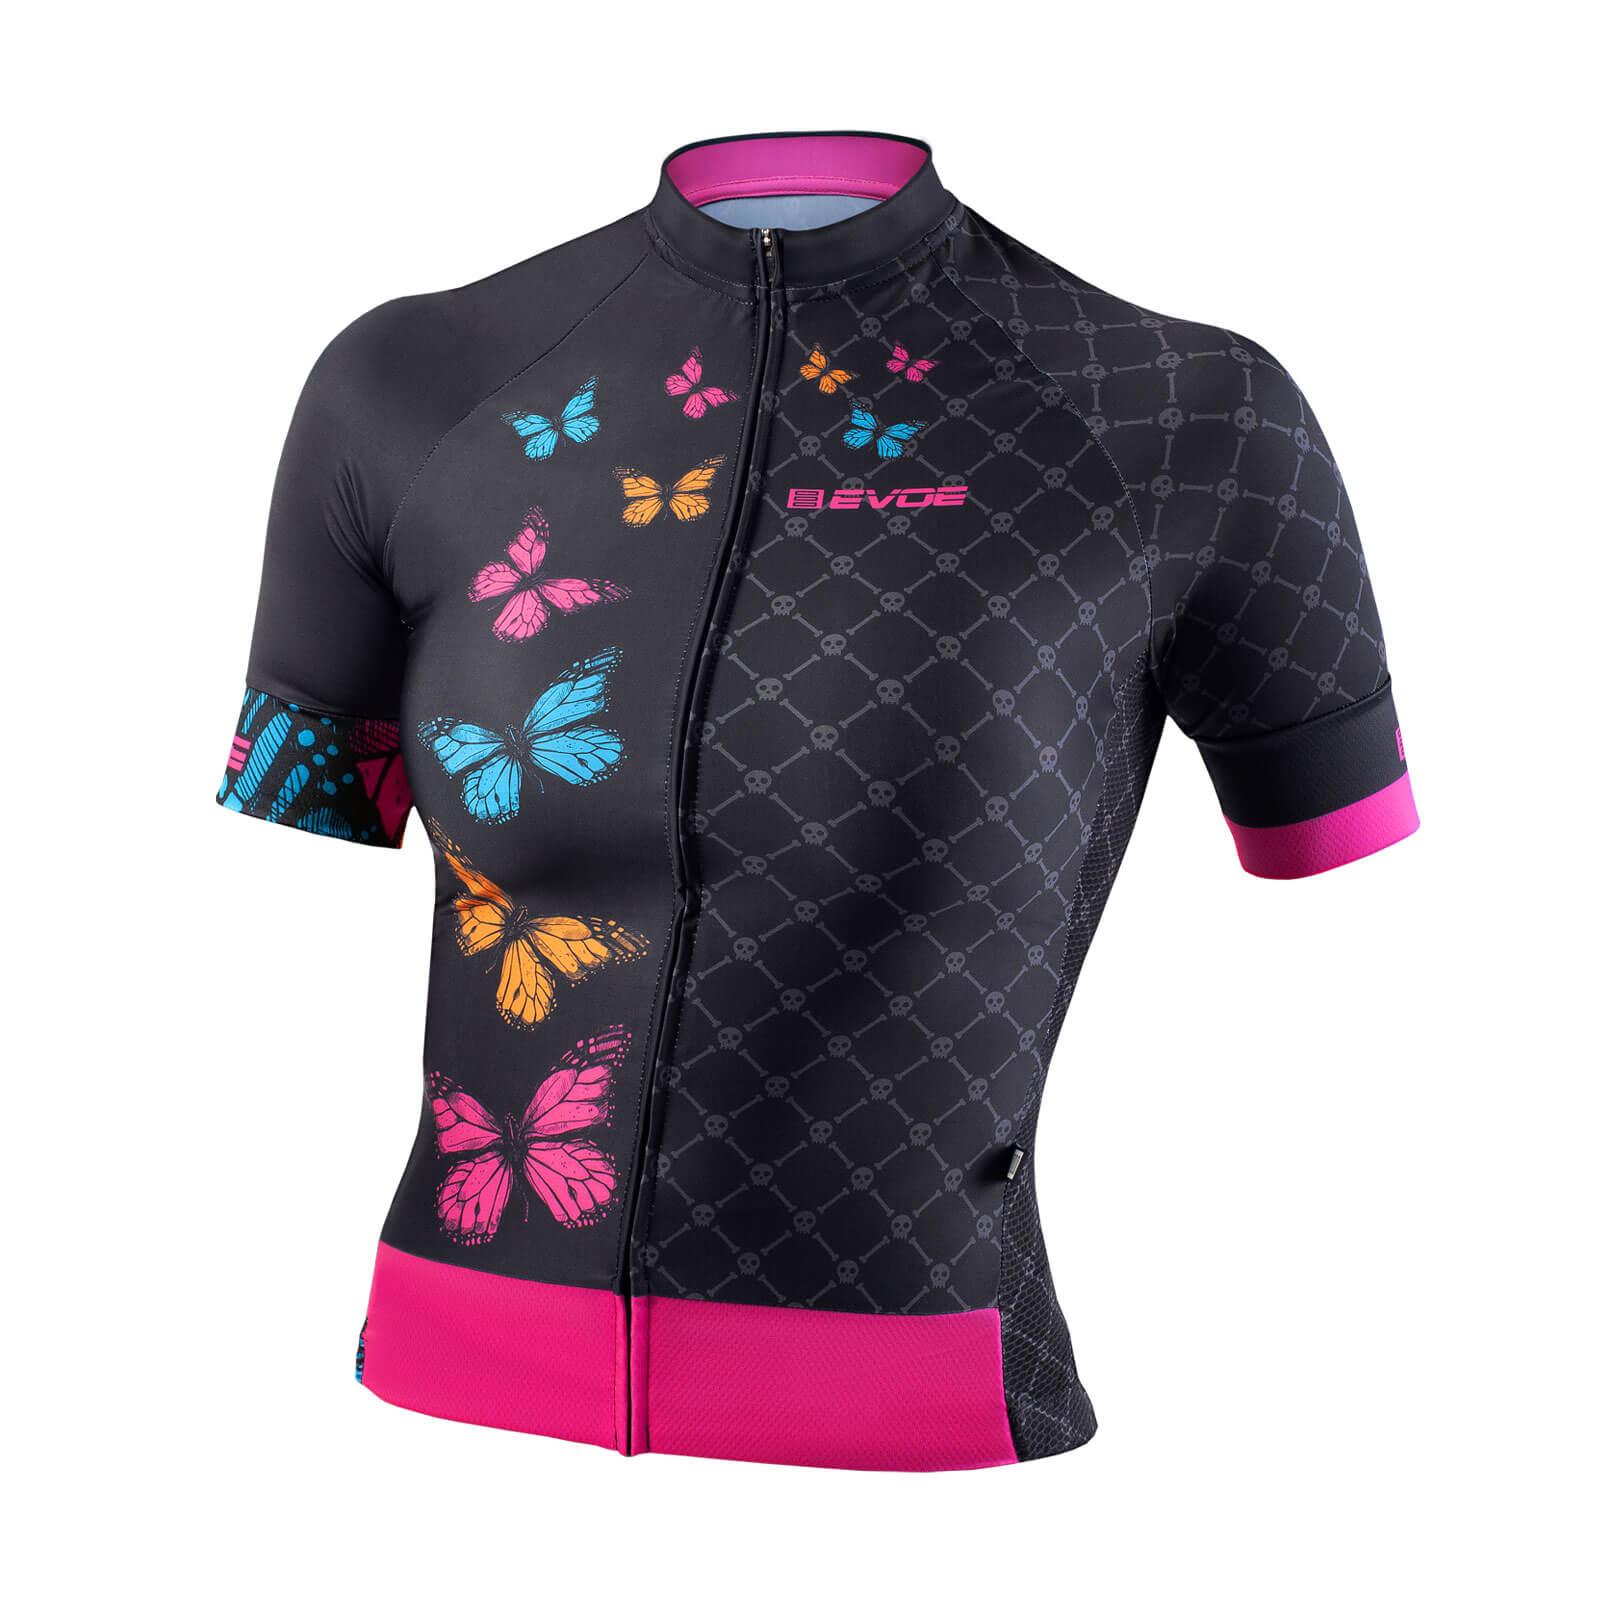 Camisa Evoe feminina na cor Preto/Borboletas